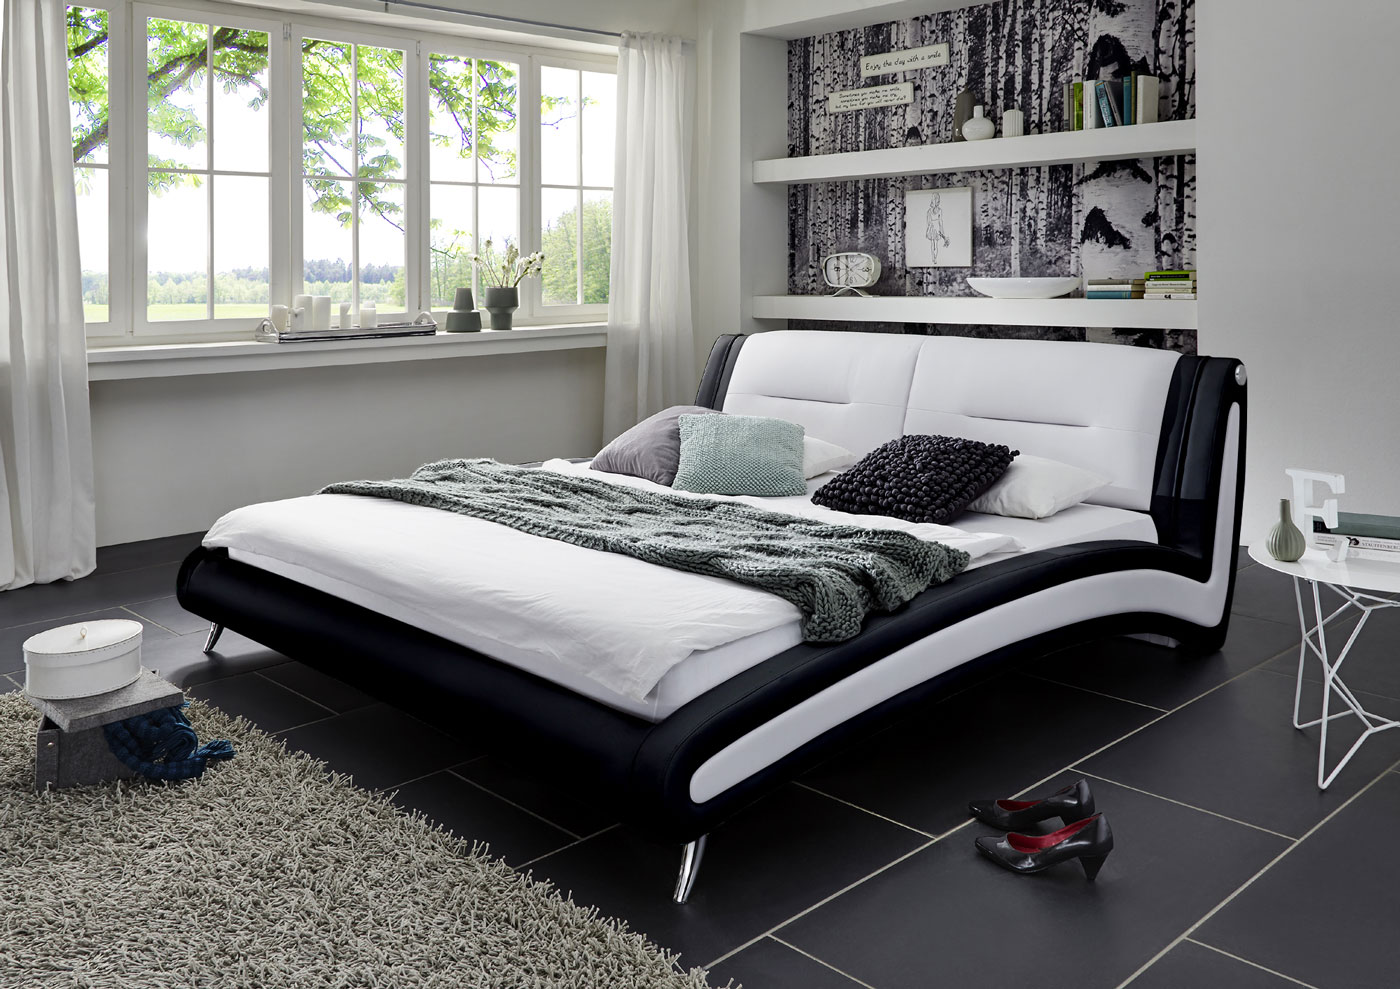 Polsterbett Doppelbett 200 x 220 cm schwarz / weiß Swing